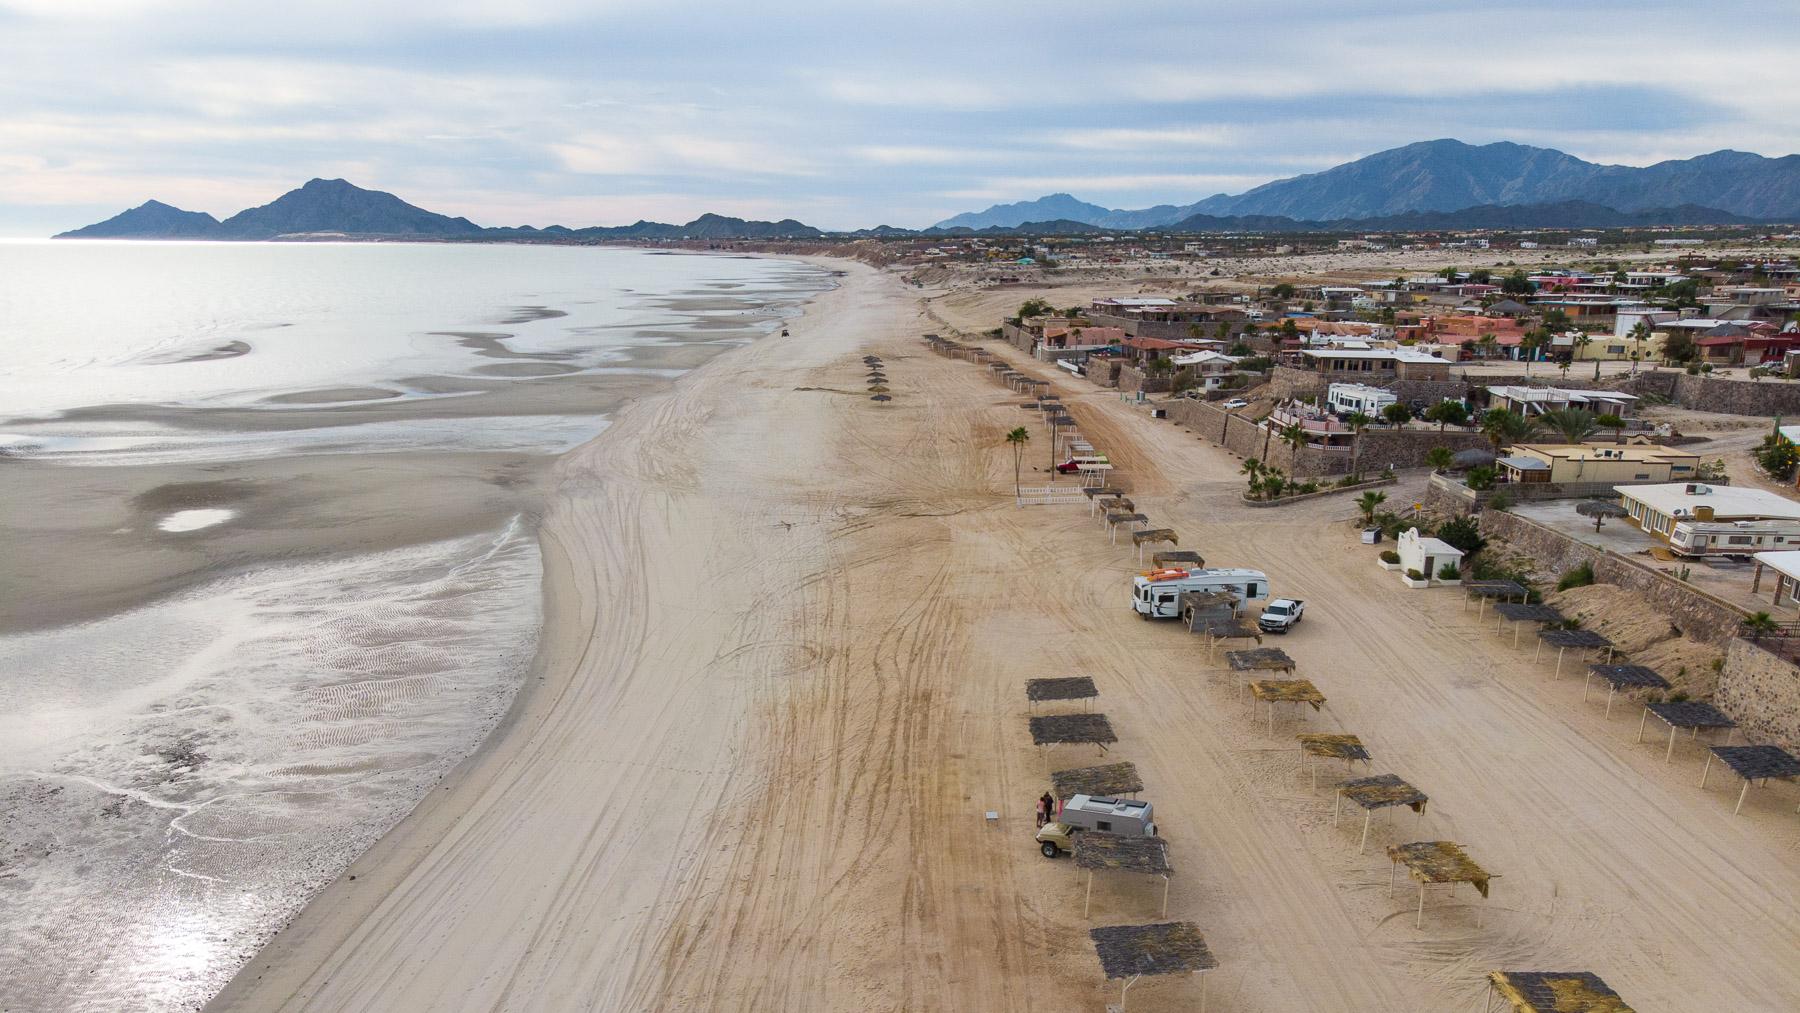 Sandstrand bei San Felipe, Ostküste der Baja